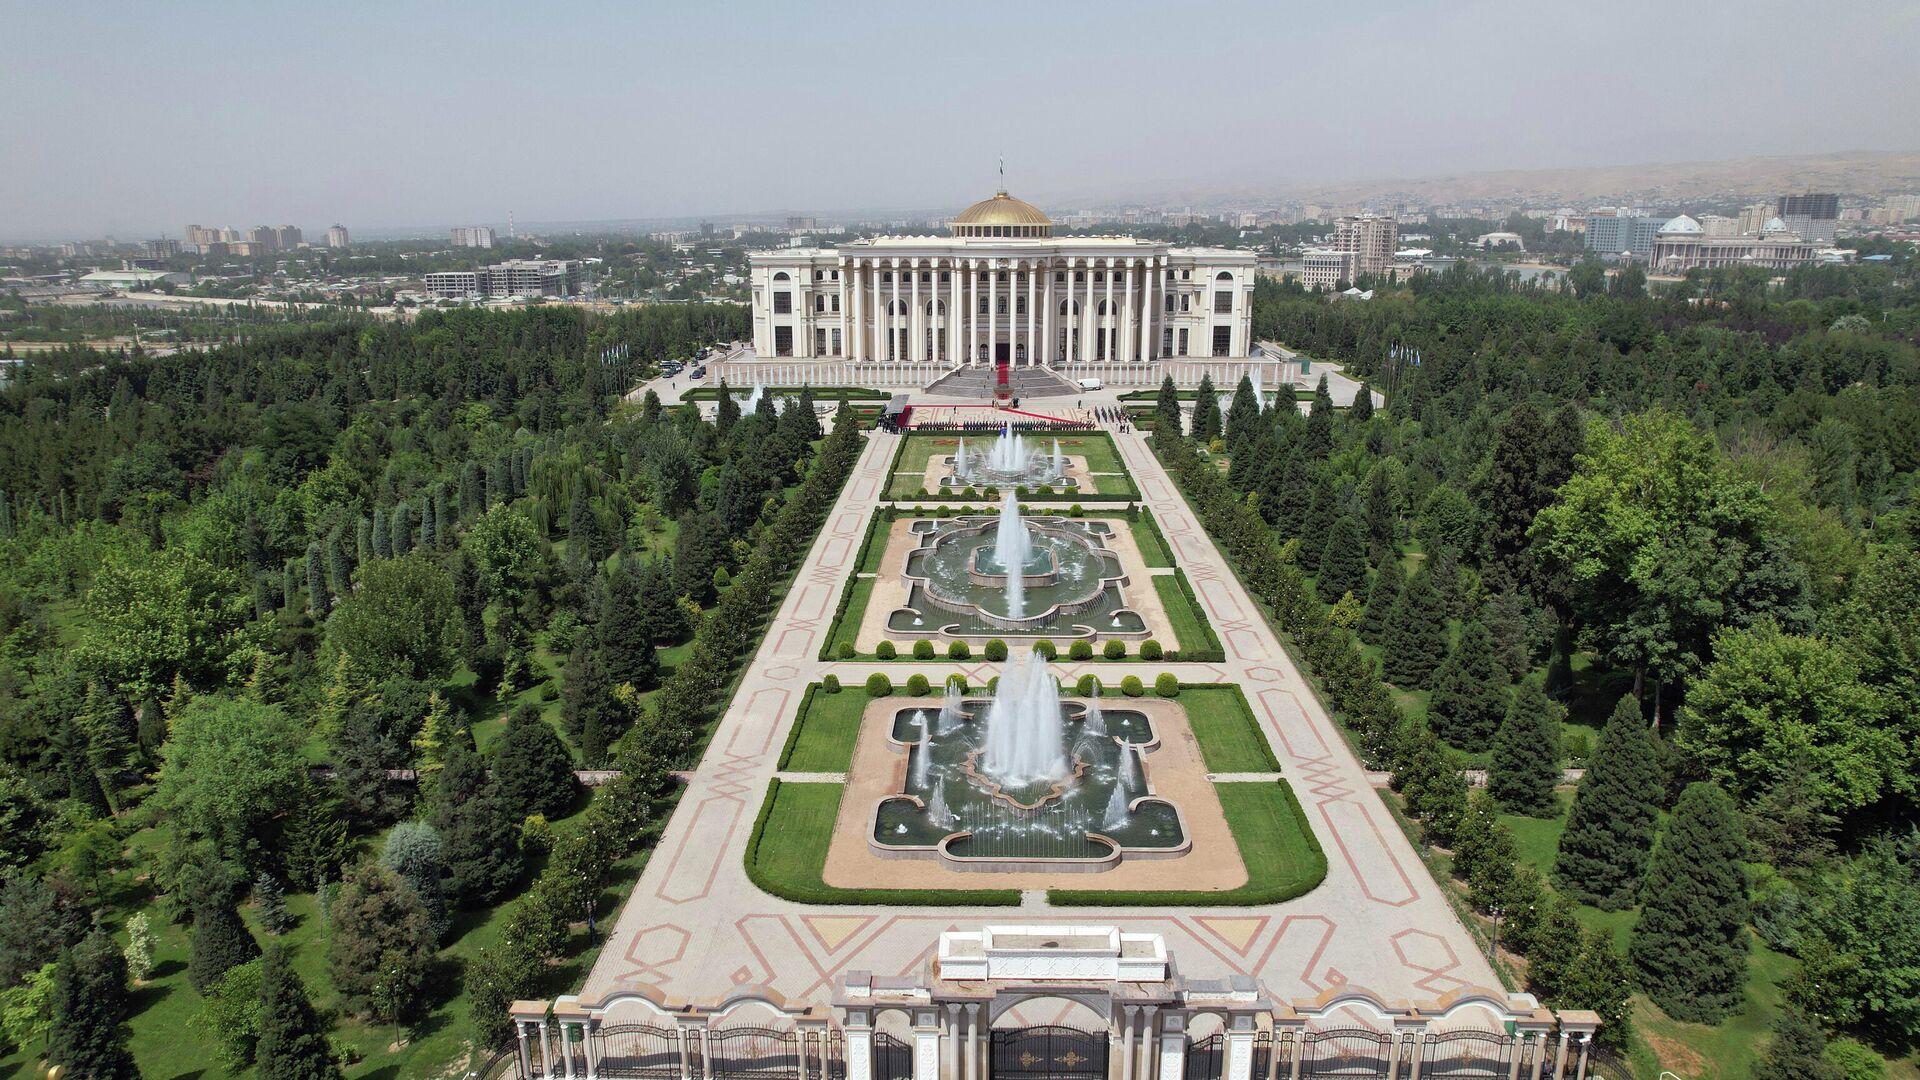 Дворец Нации в Душанбе - Sputnik Тоҷикистон, 1920, 20.09.2021